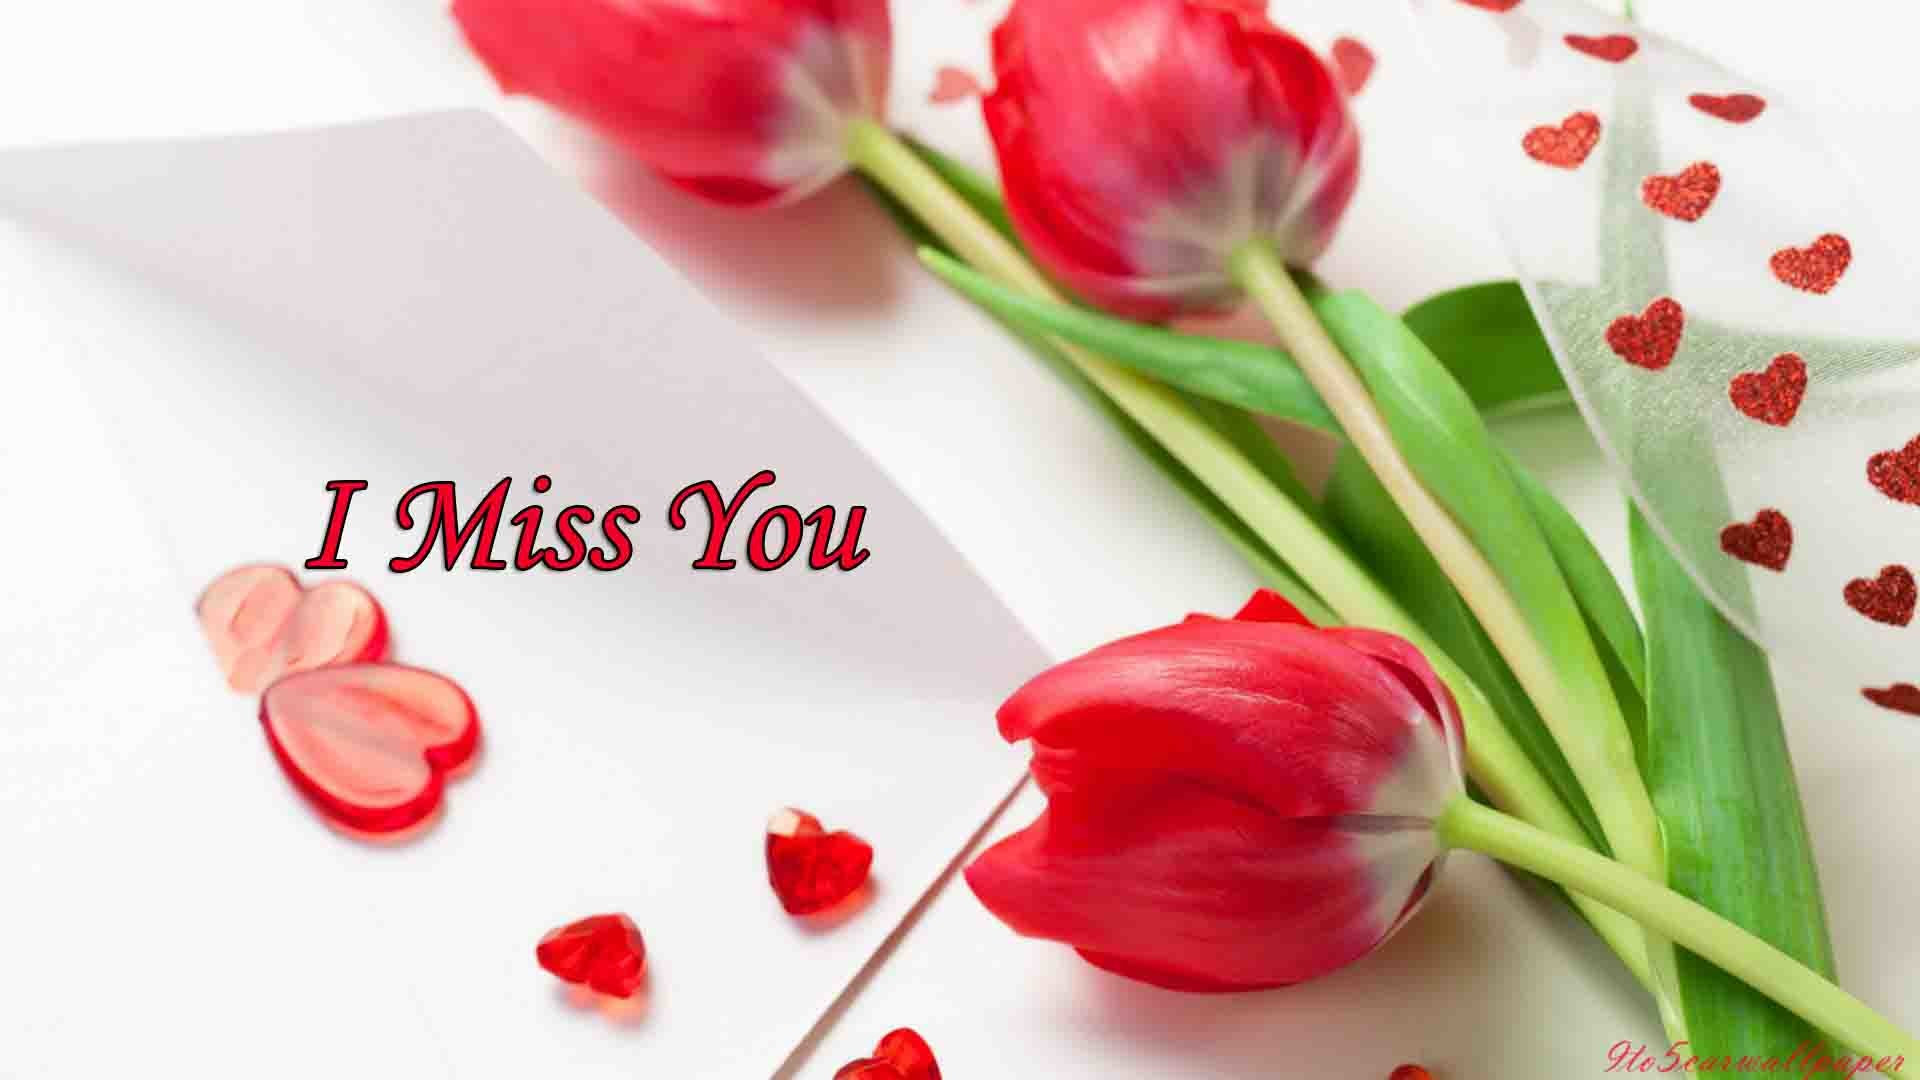 I Miss You Wallpaper 71 Images